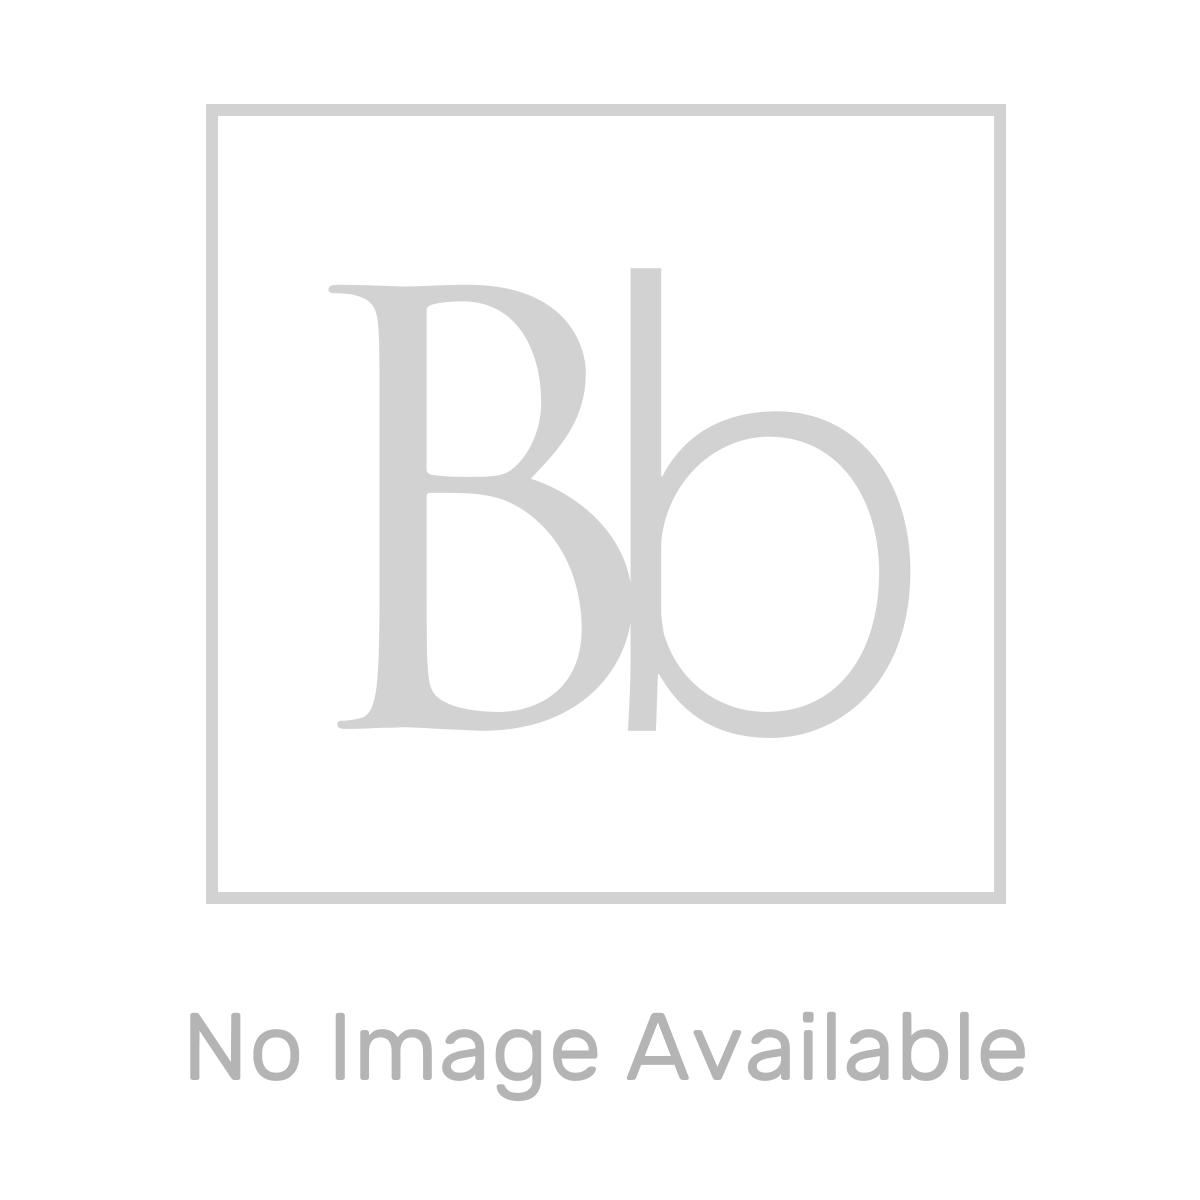 April Rectangular Anti Slip Shower Tray 1200 x 760 Line Drawing